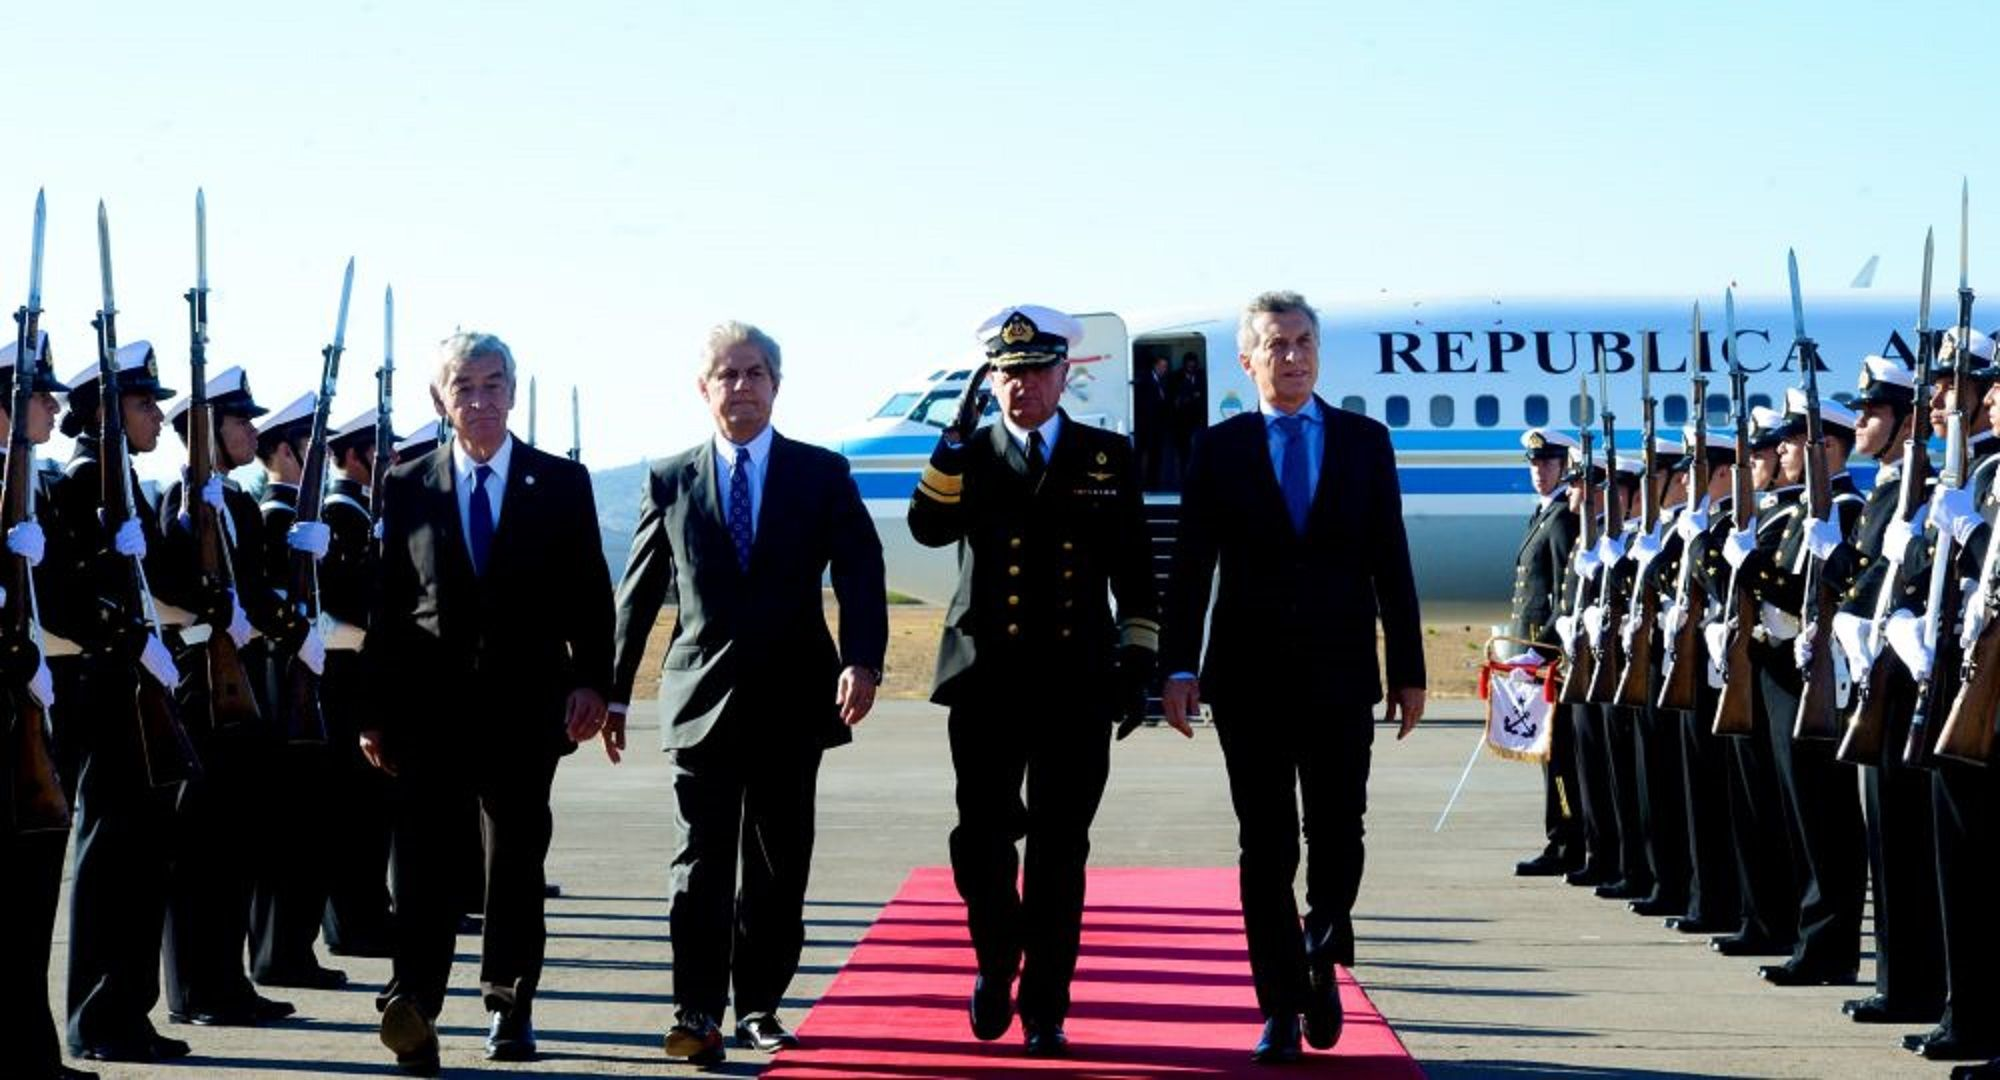 La llegada del presidente Mauricio Macri a Chile.